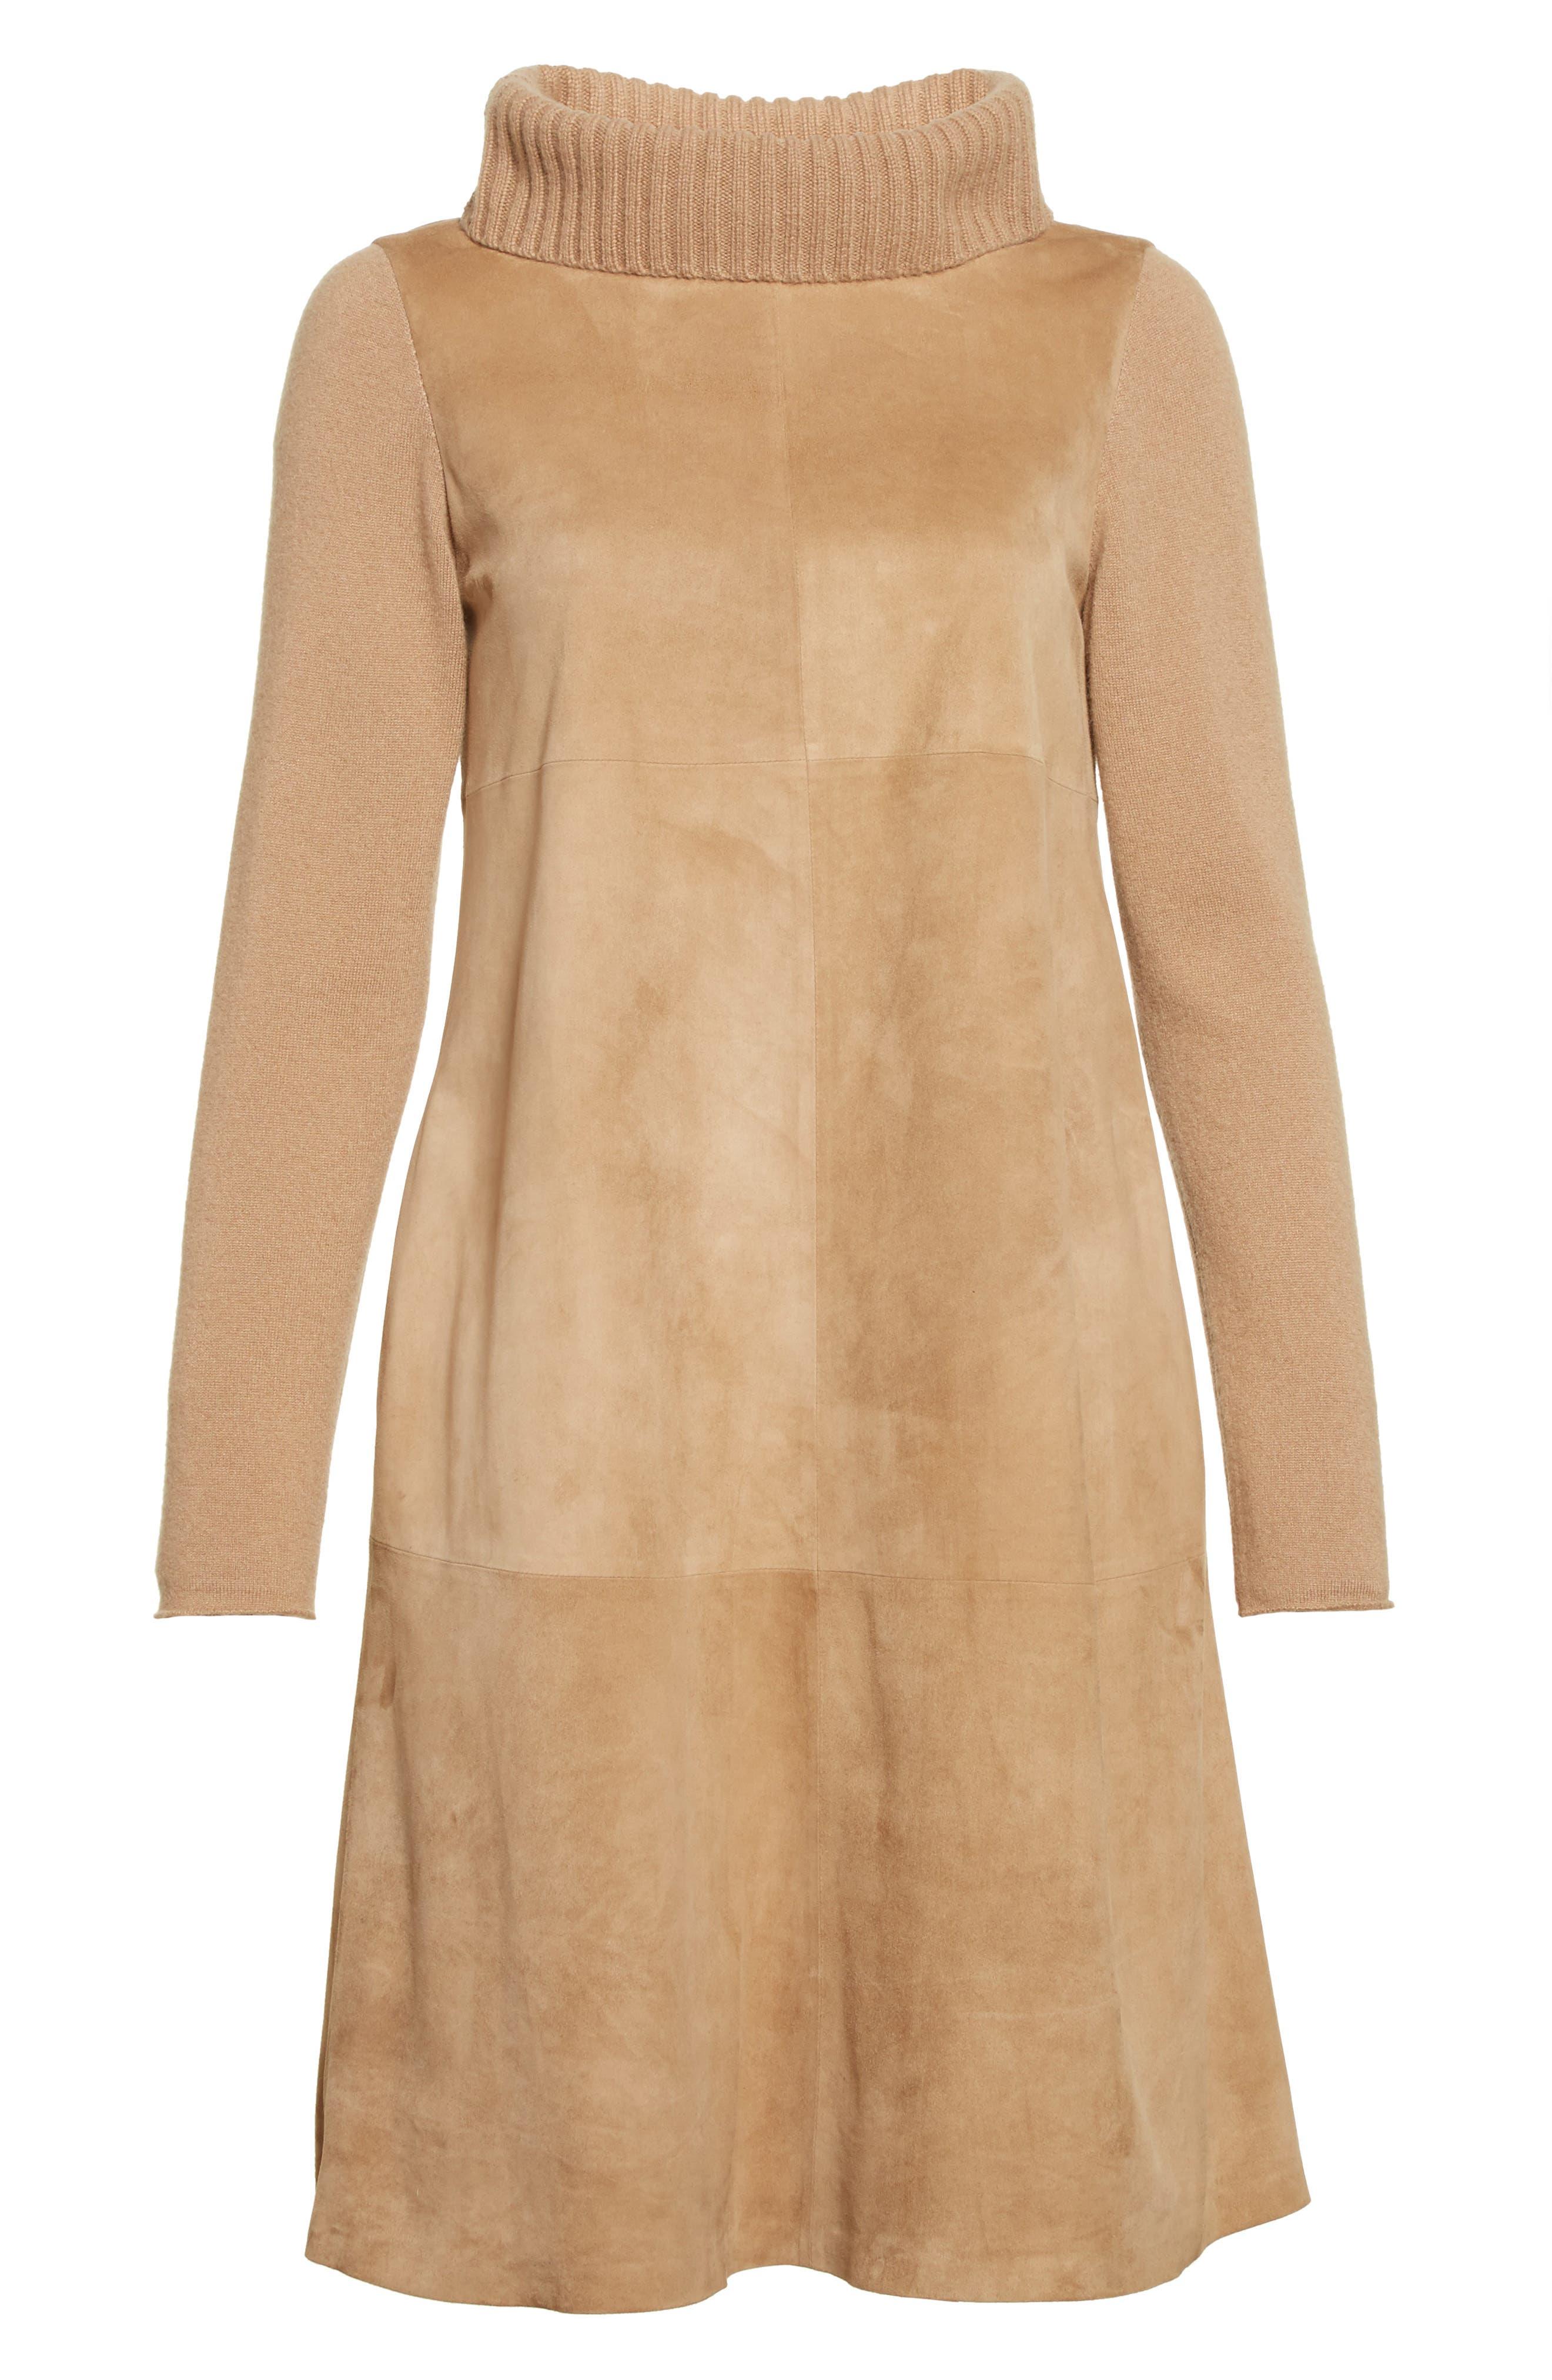 Alternate Image 4  - Fabiana Filippi Suede & Cashmere Dress